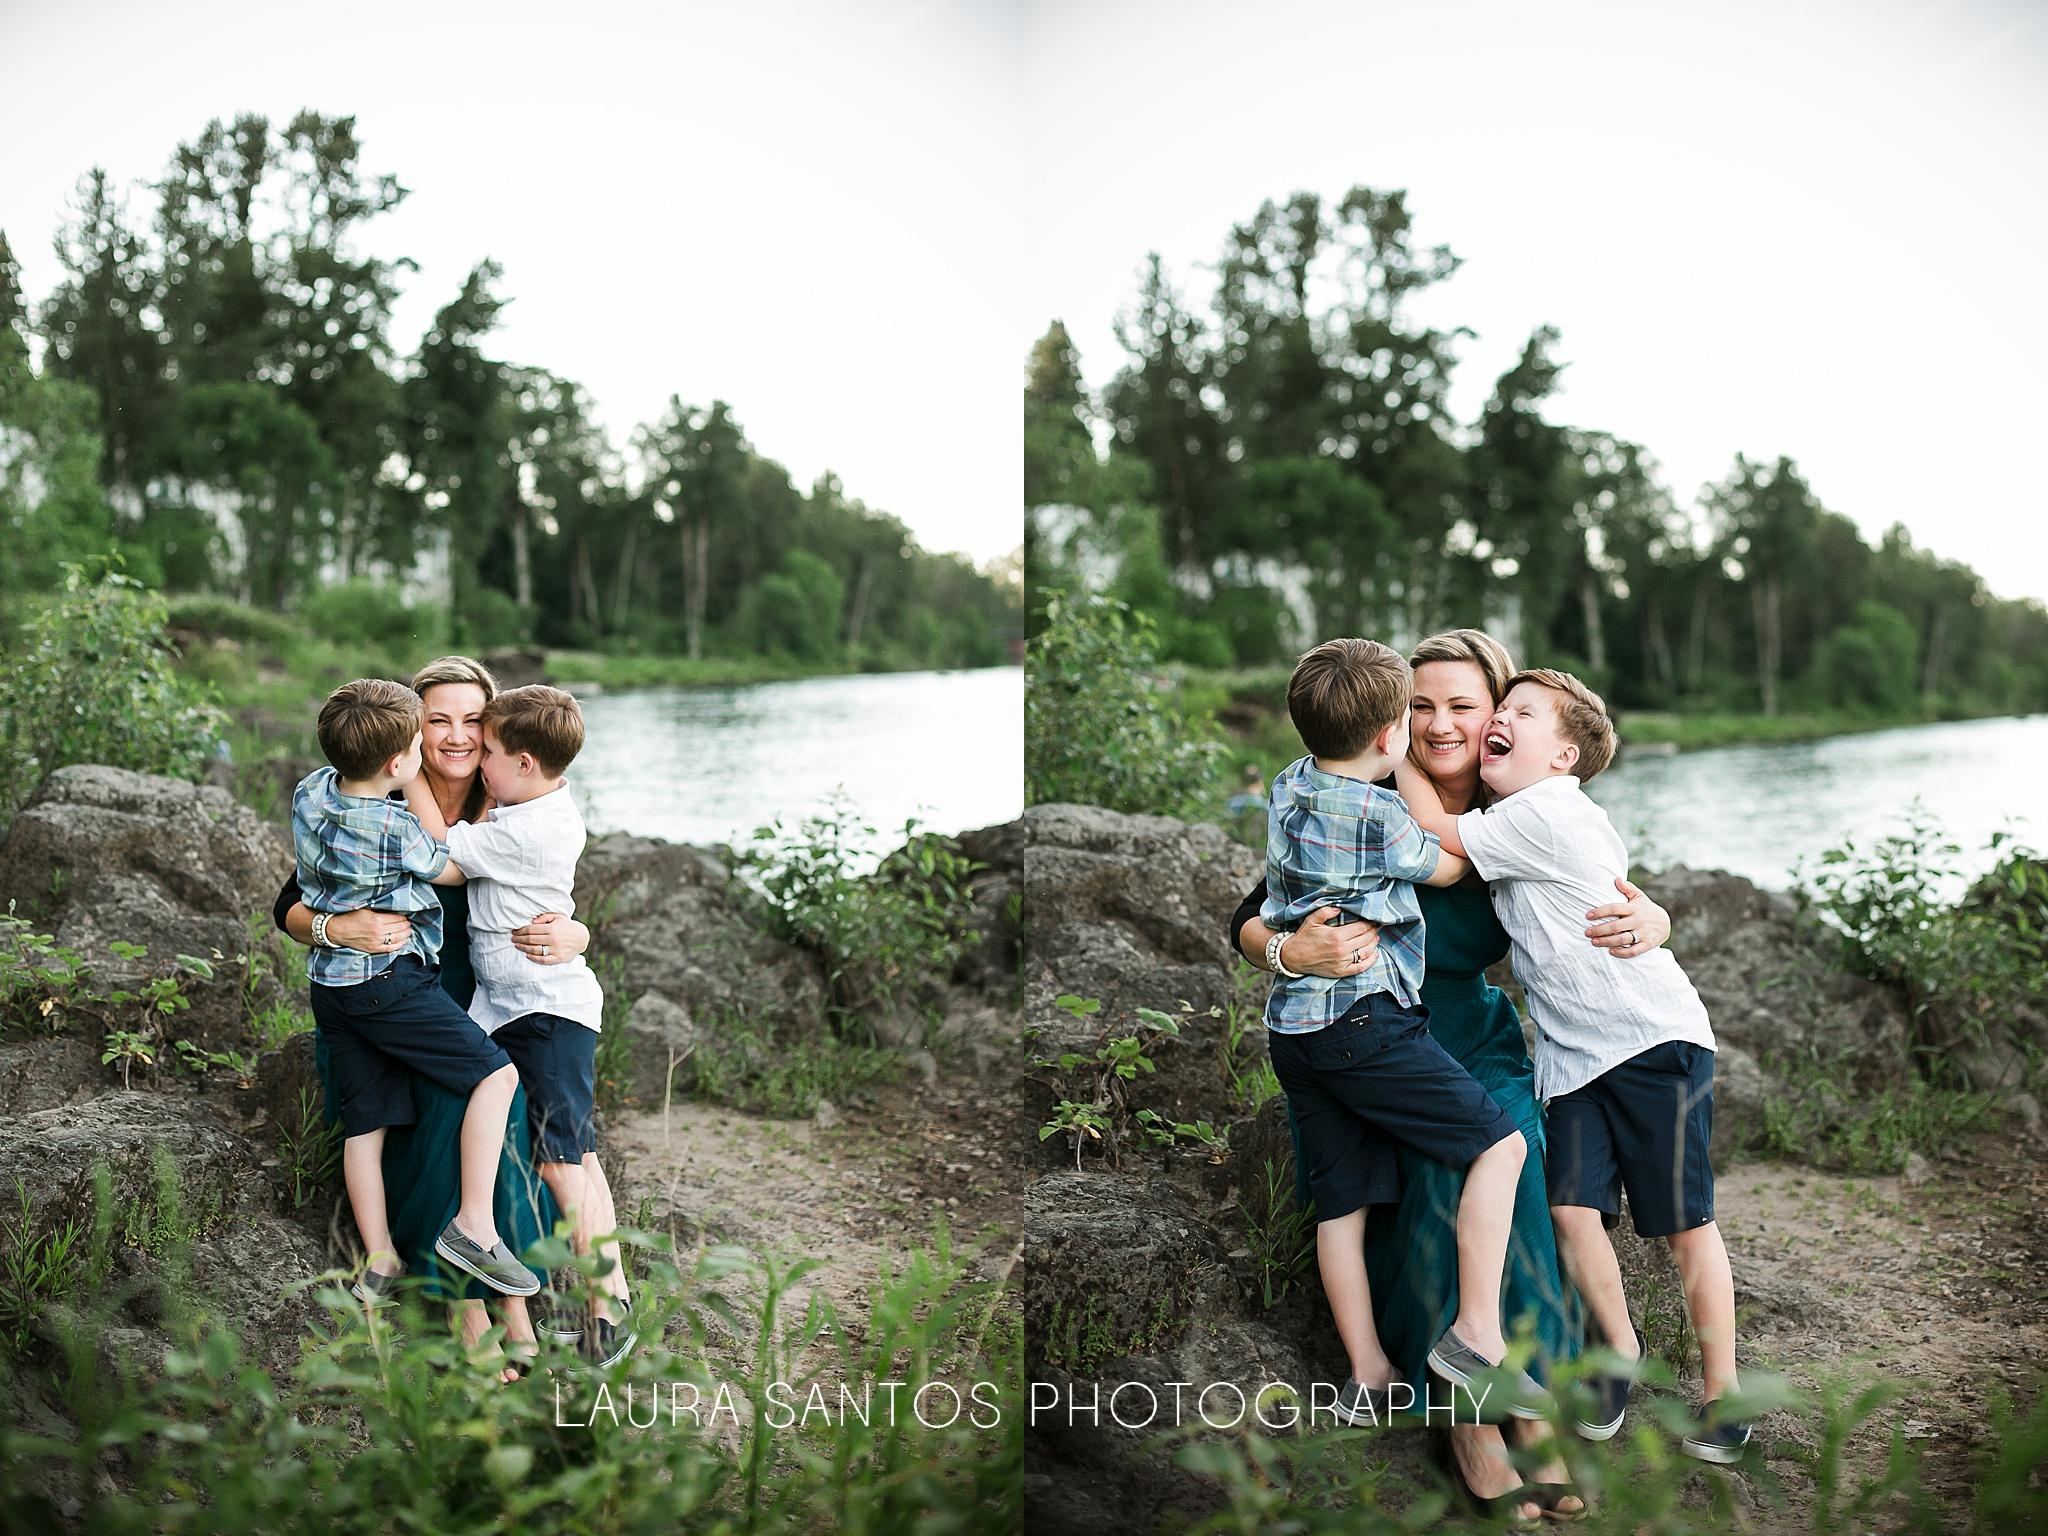 Laura Santos Photography Portland Oregon Family Photographer_1009.jpg